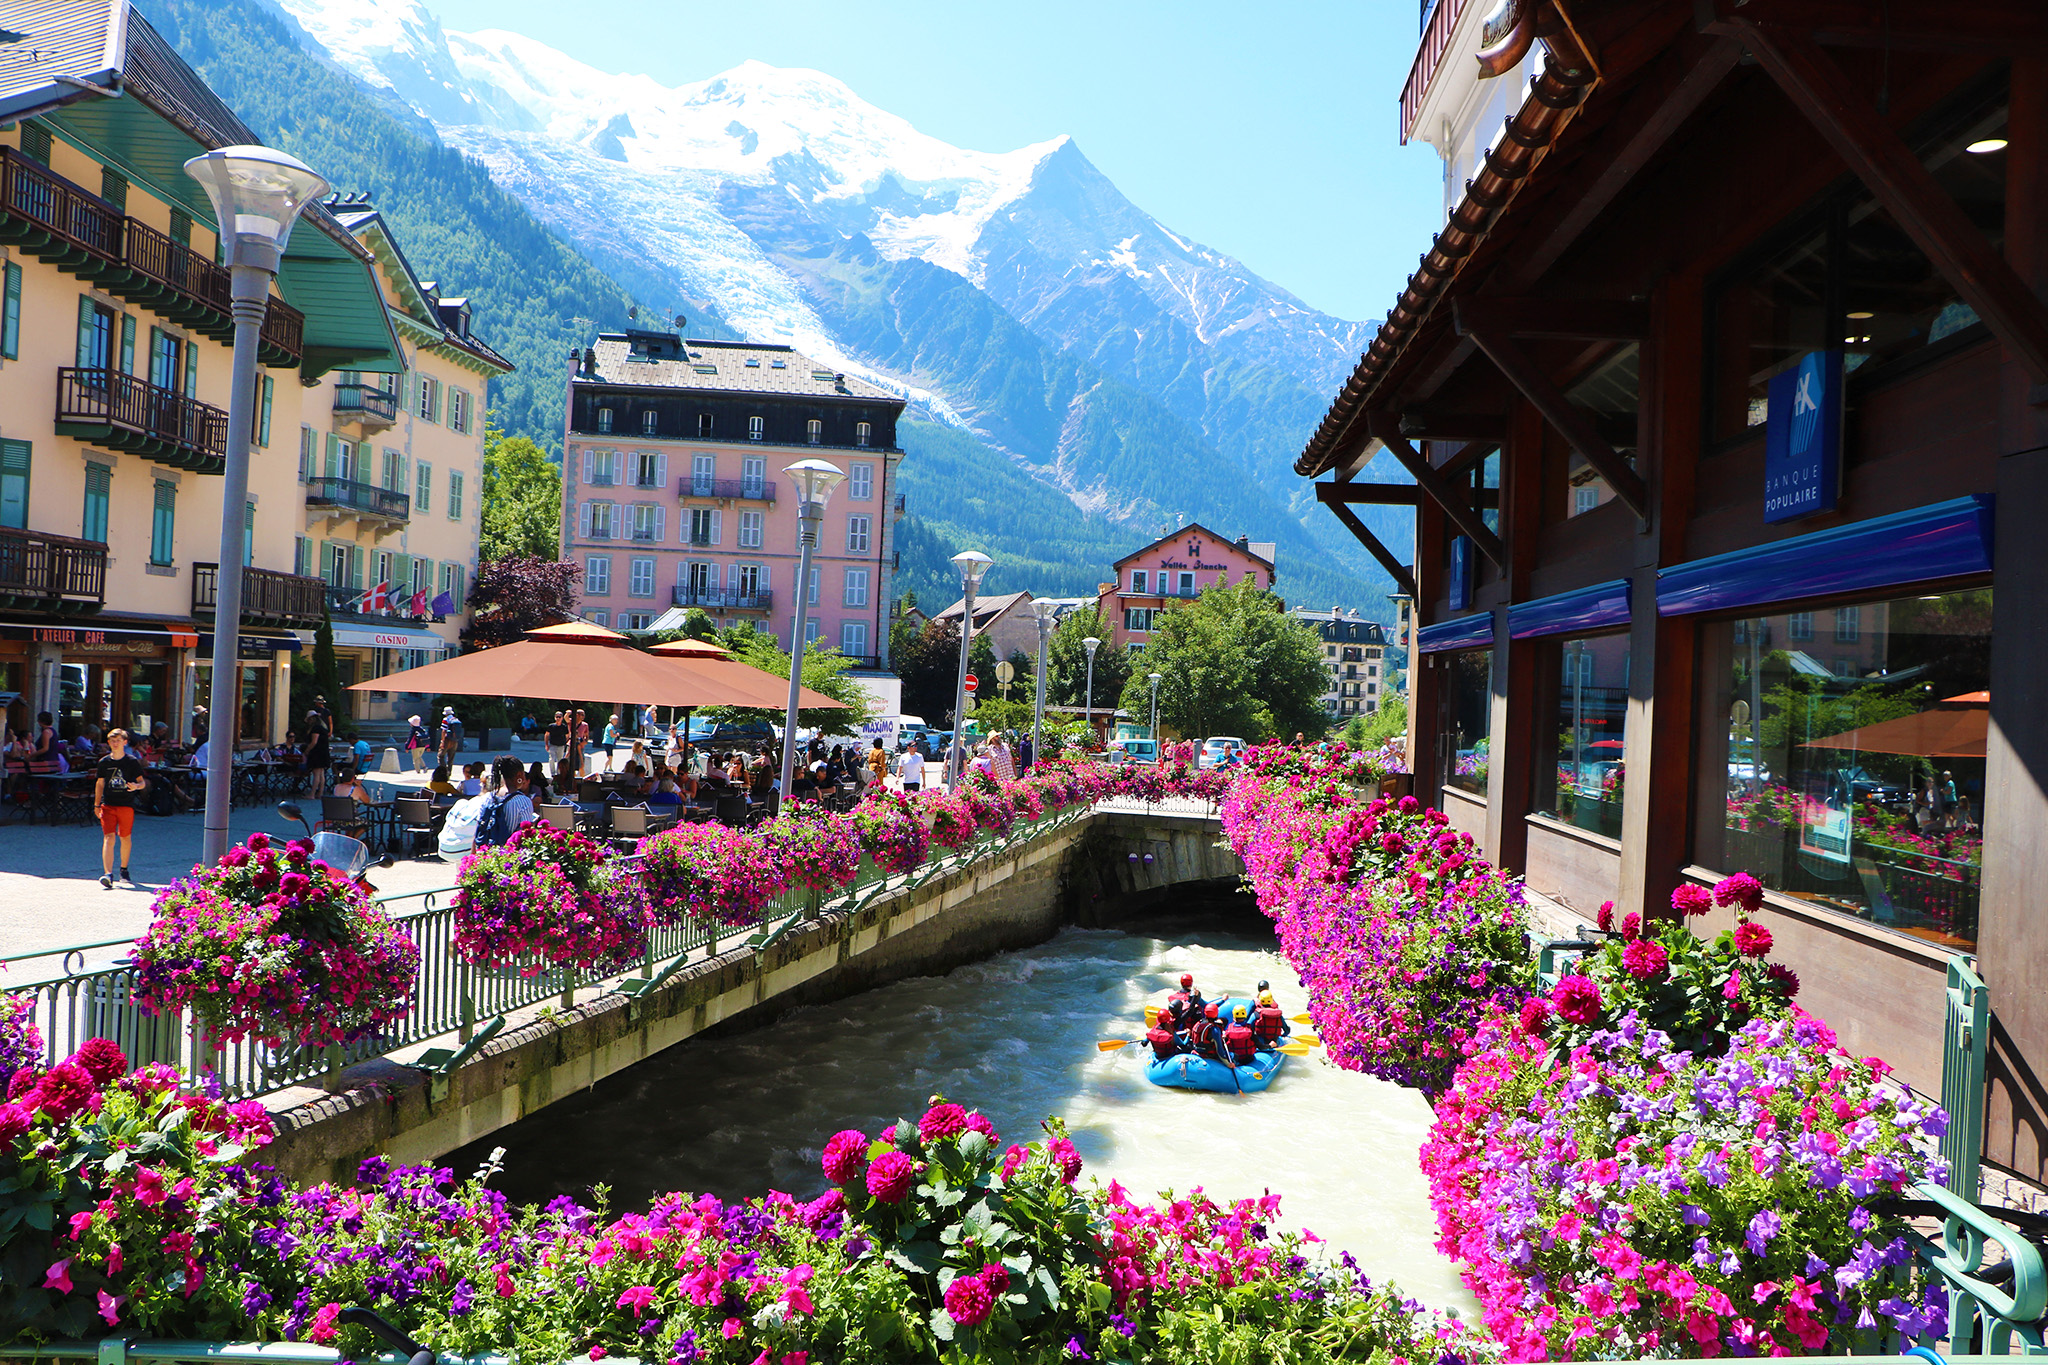 kt_2020_100_keytours_excursions_swisstours_chamonix_mont-blanc_village7_2048_10